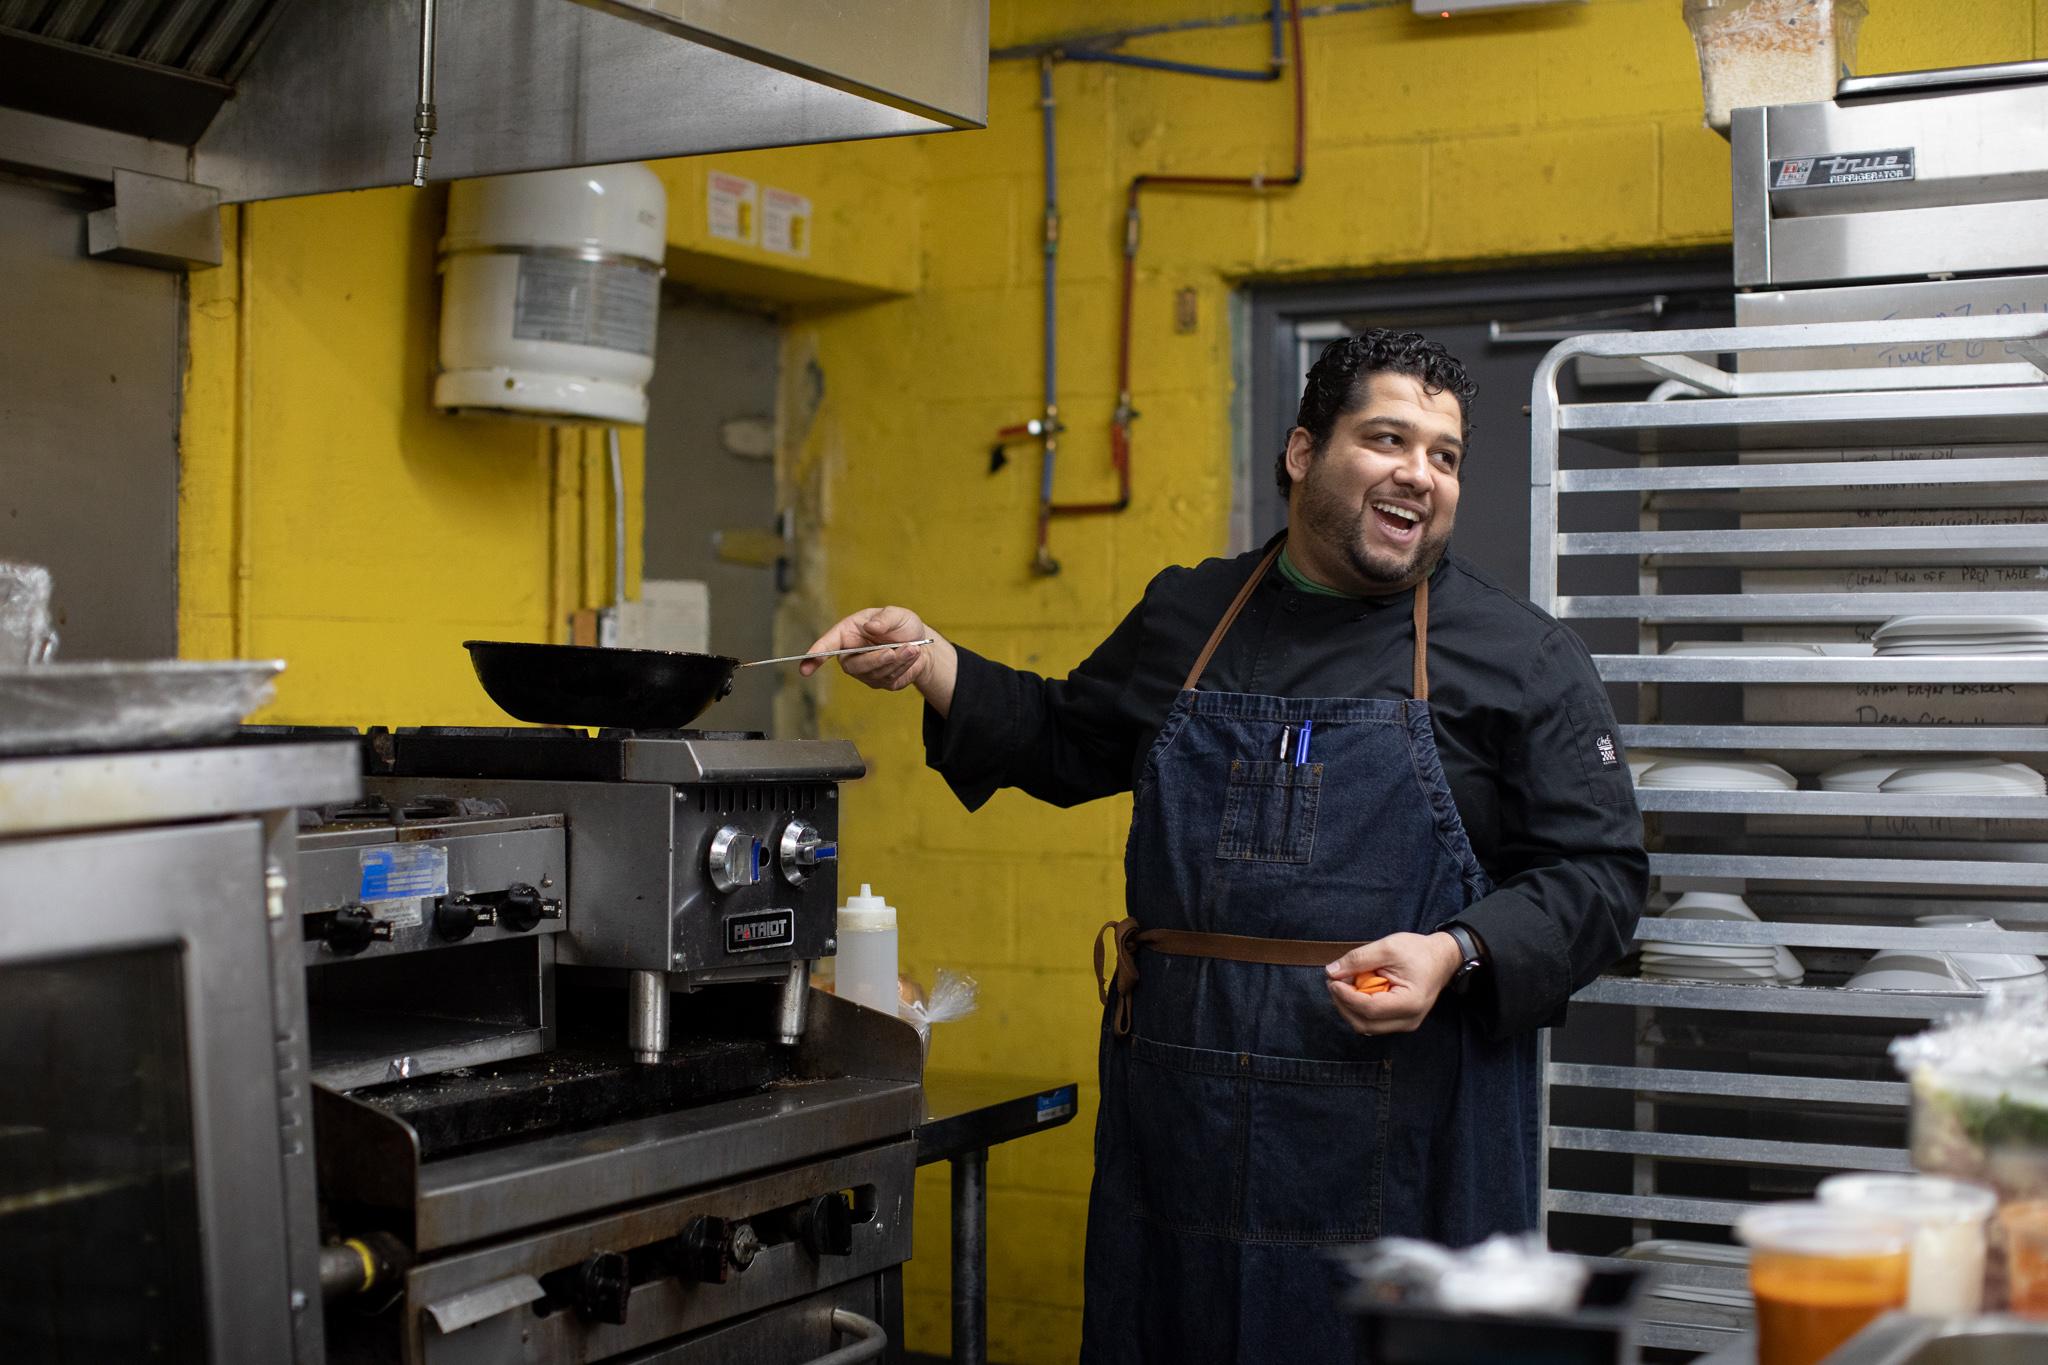 Chef Omar Anani prepares food in his kitchen at Saffron De Twah.